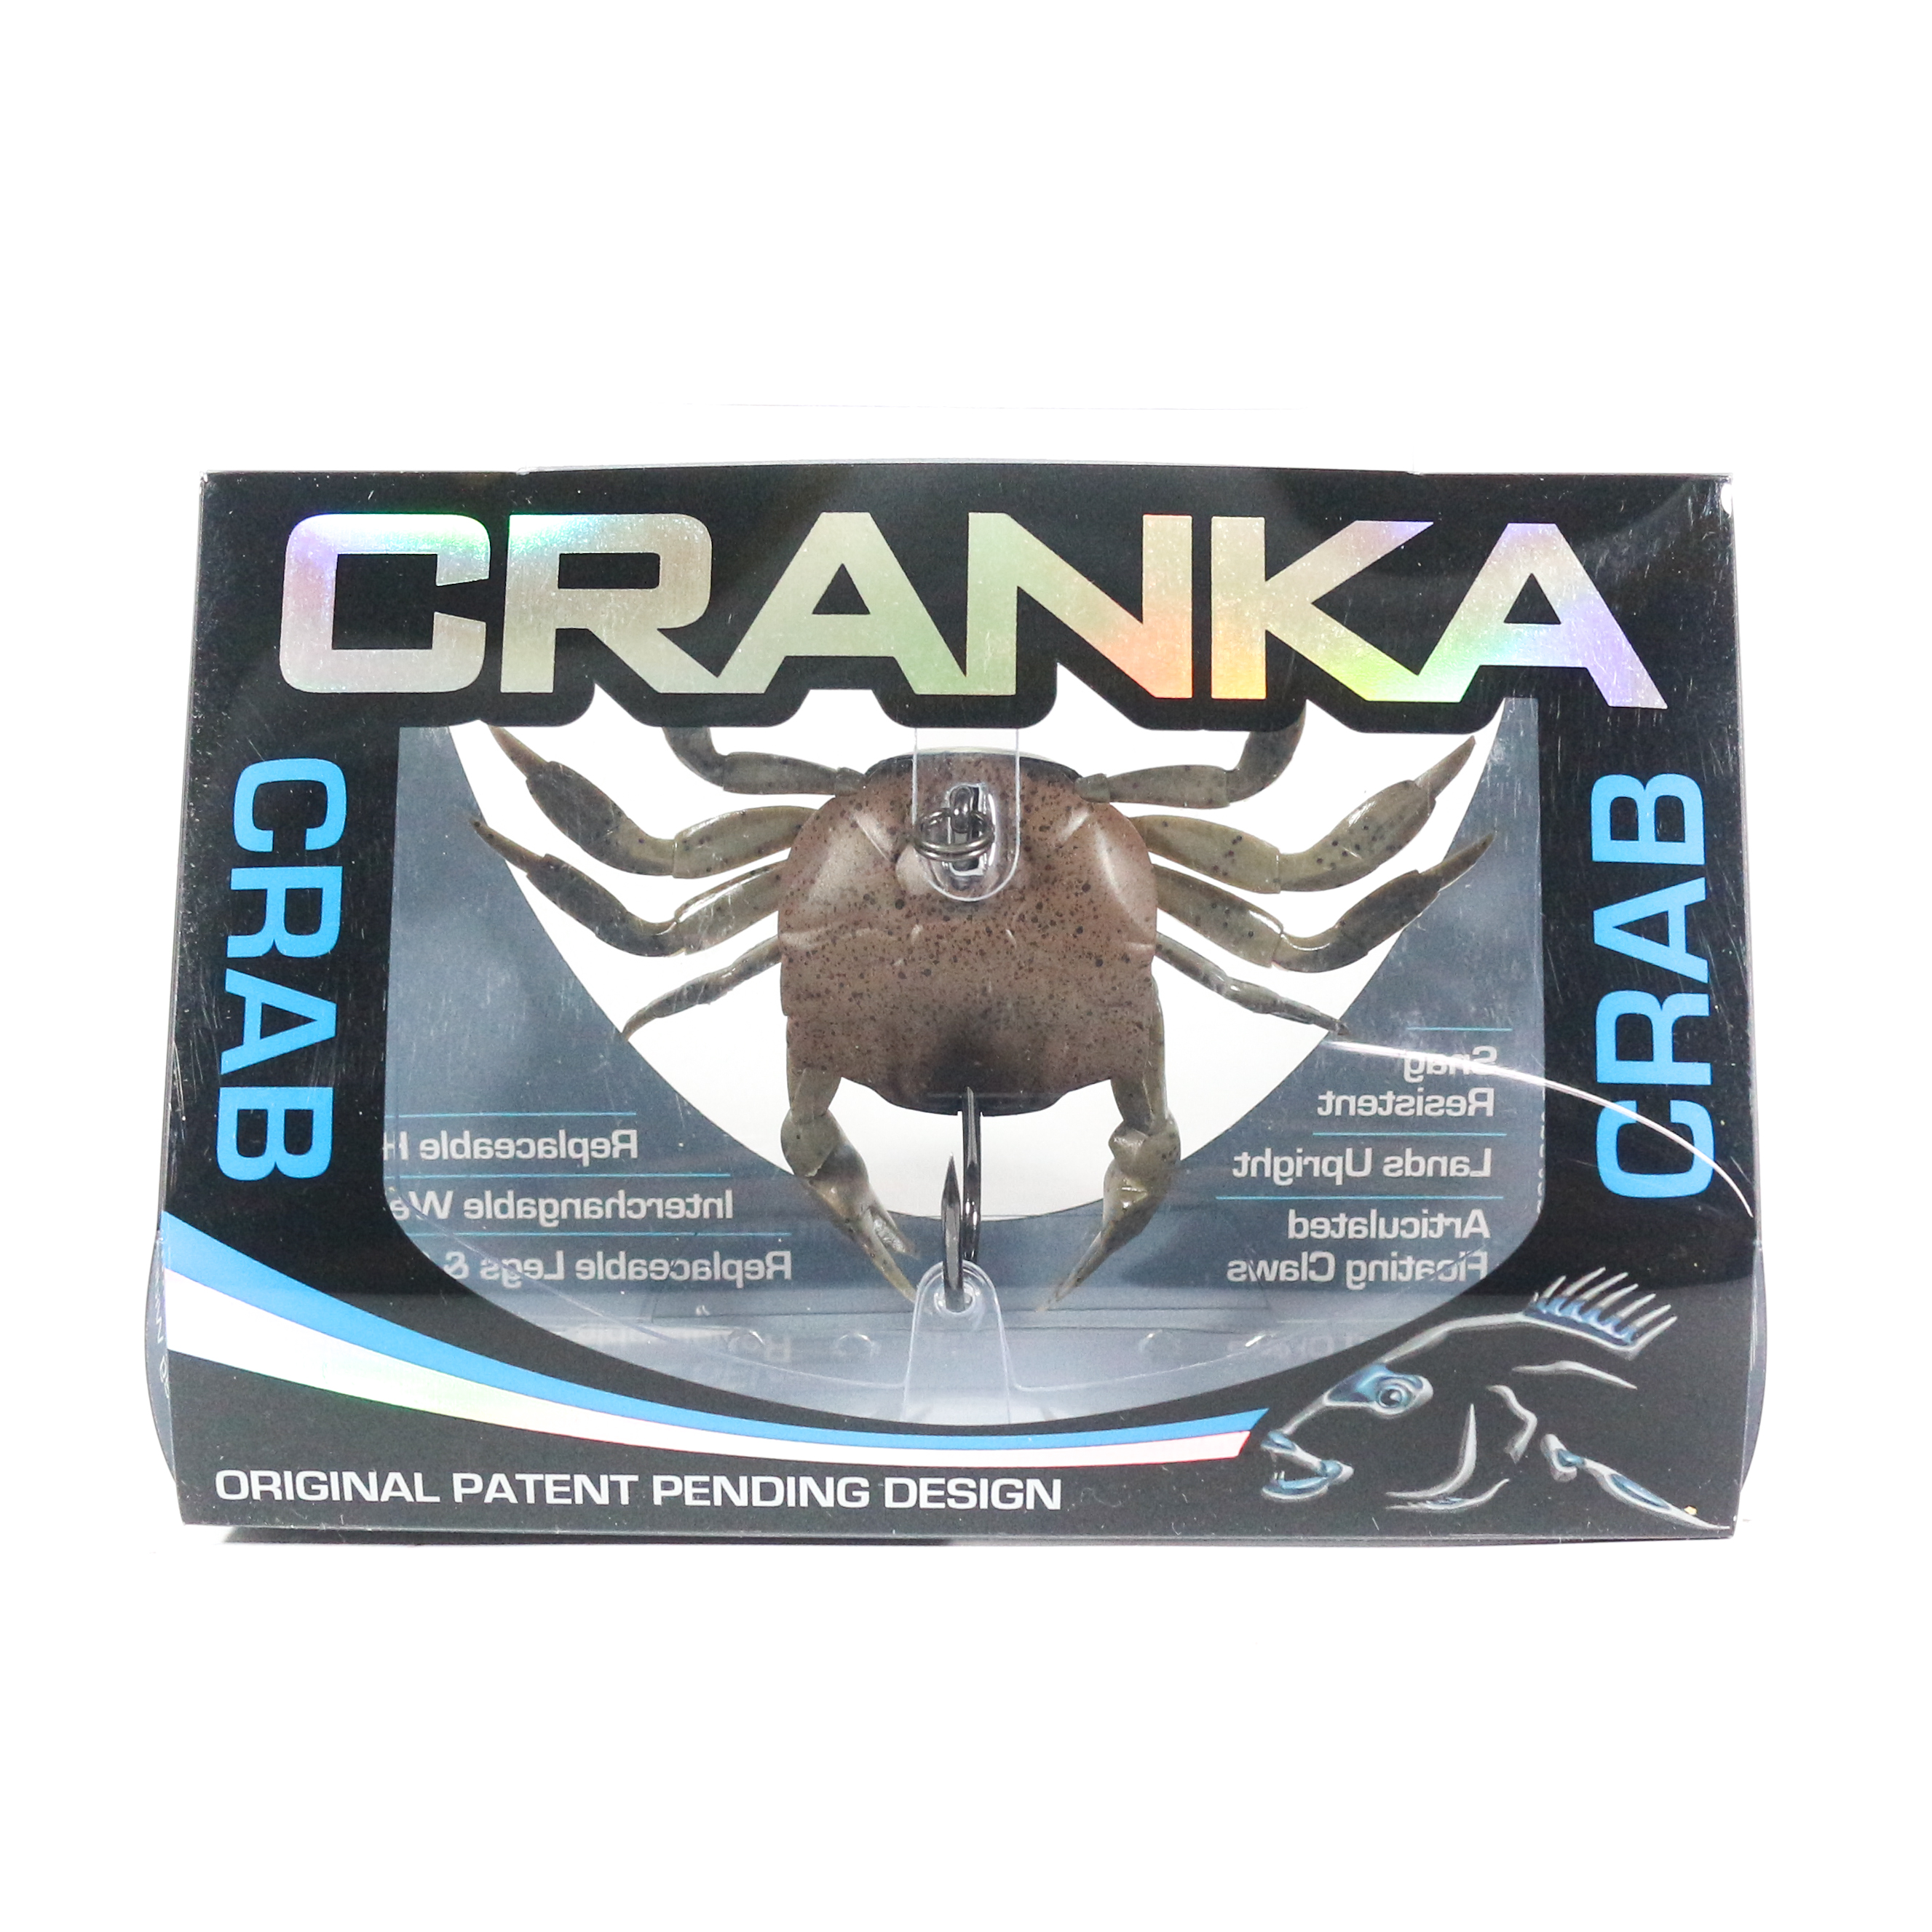 Cranka Crab Sinking Lure 21 grams CRS-85-BRN (5426)